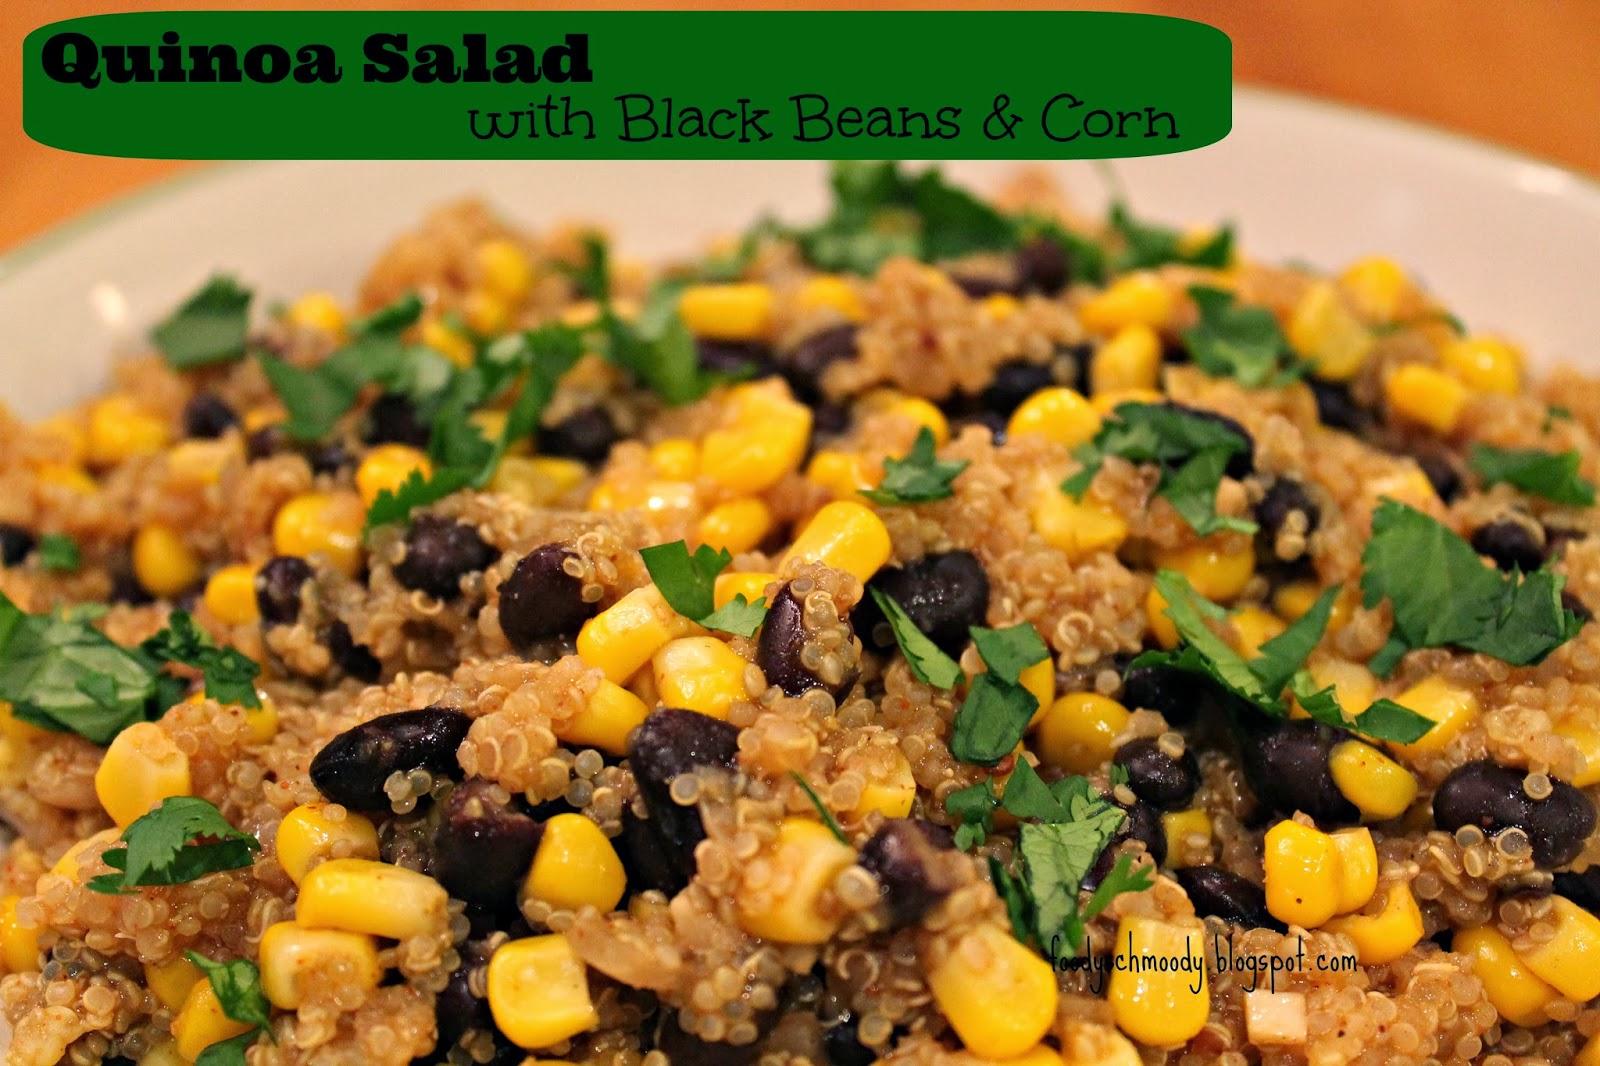 Quinoa Salad w/ Black Beans & Corn - Foody Schmoody Blog | Foody ...